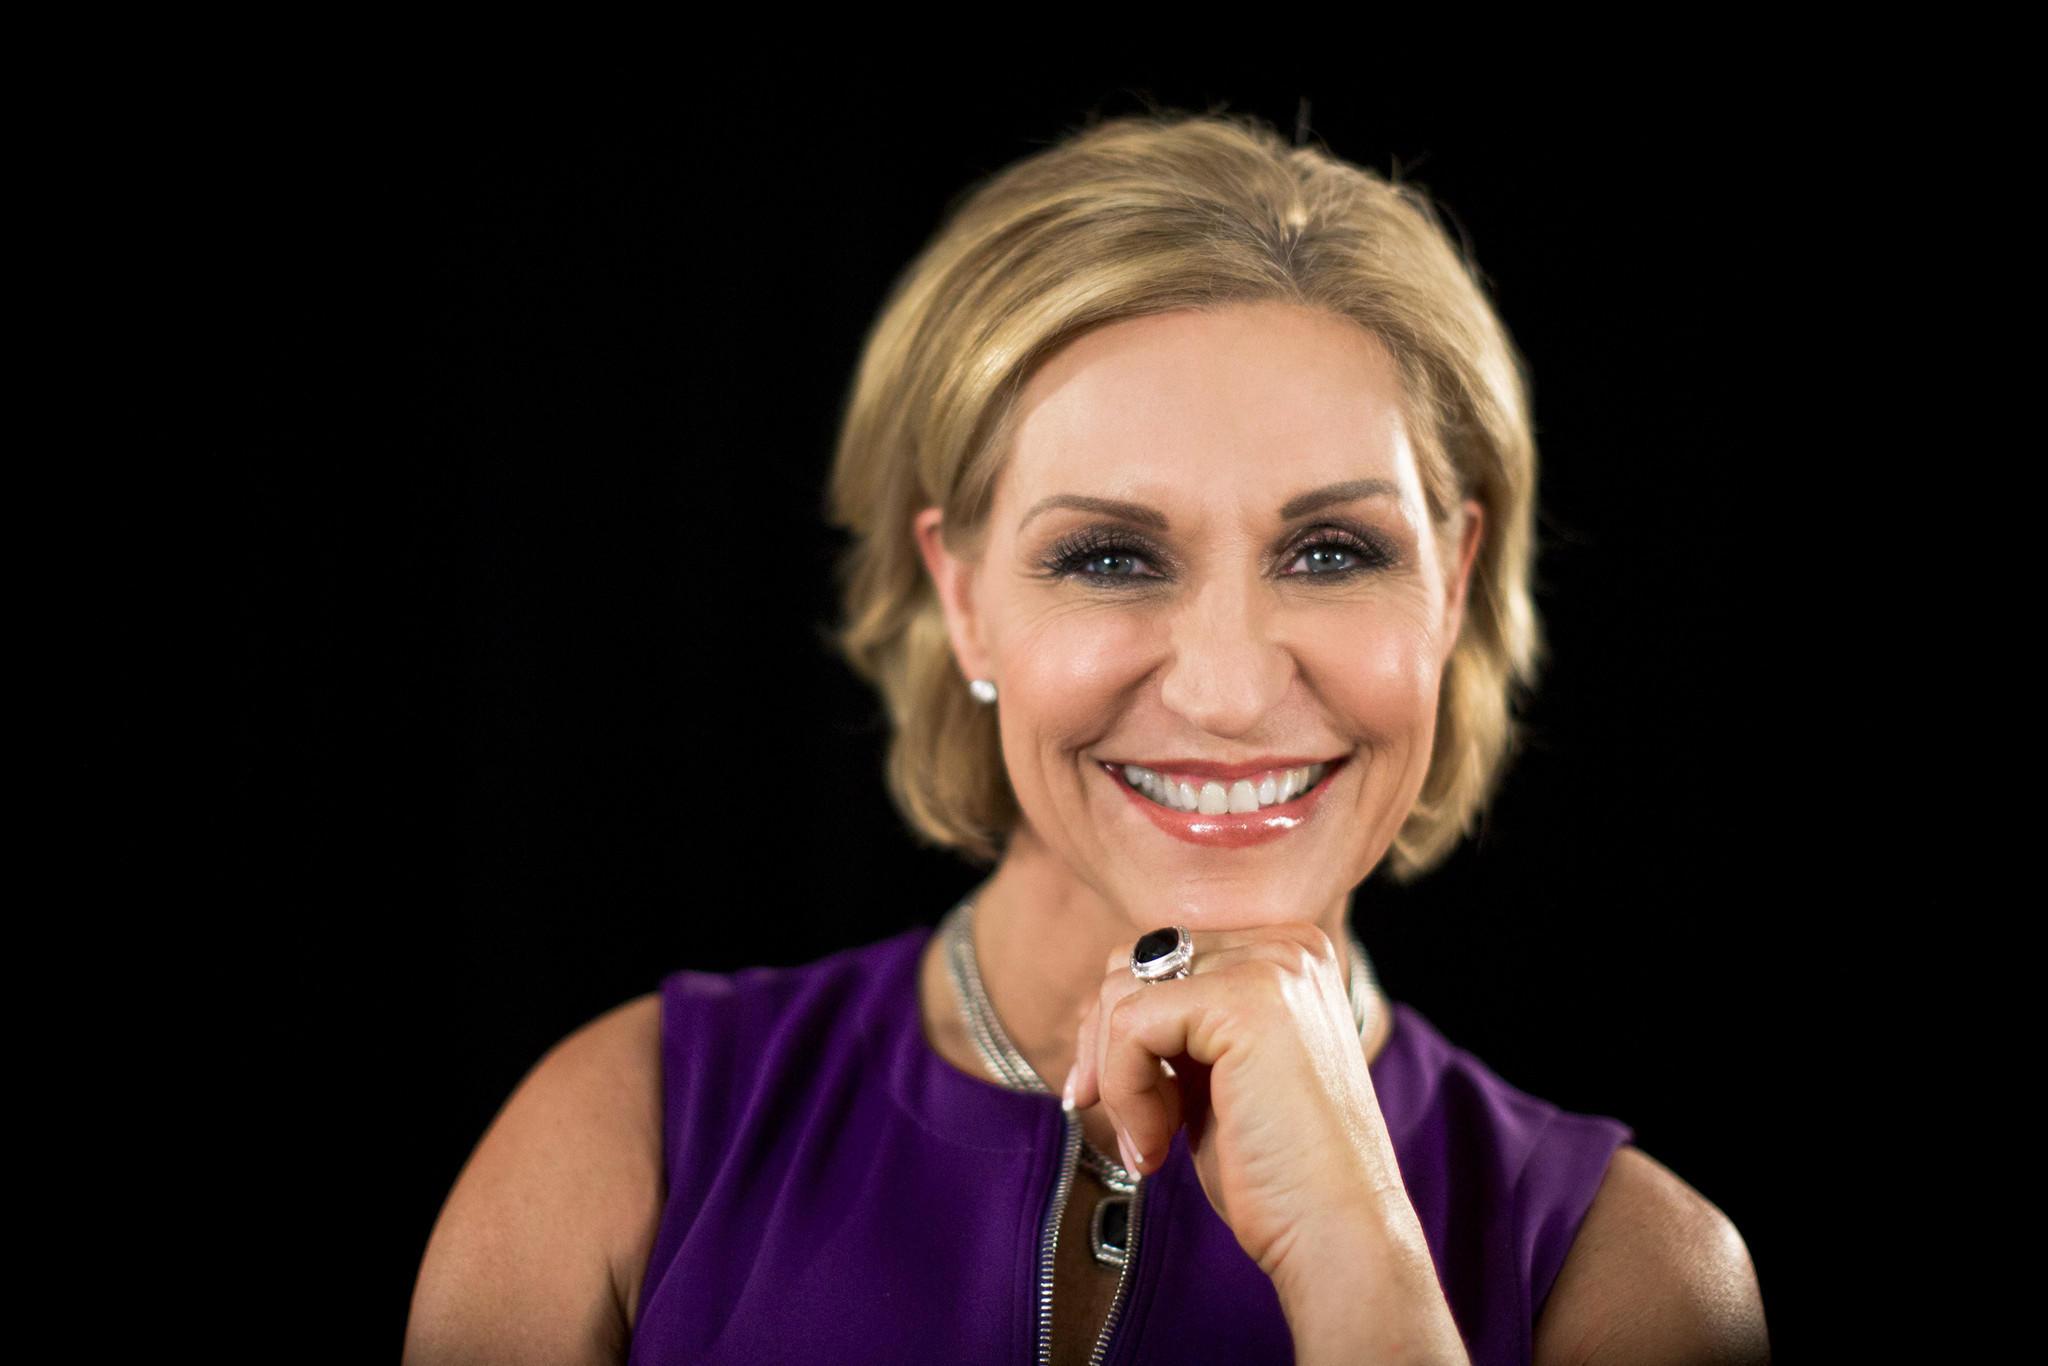 Tosca Reno Small steps to major rewards latimes